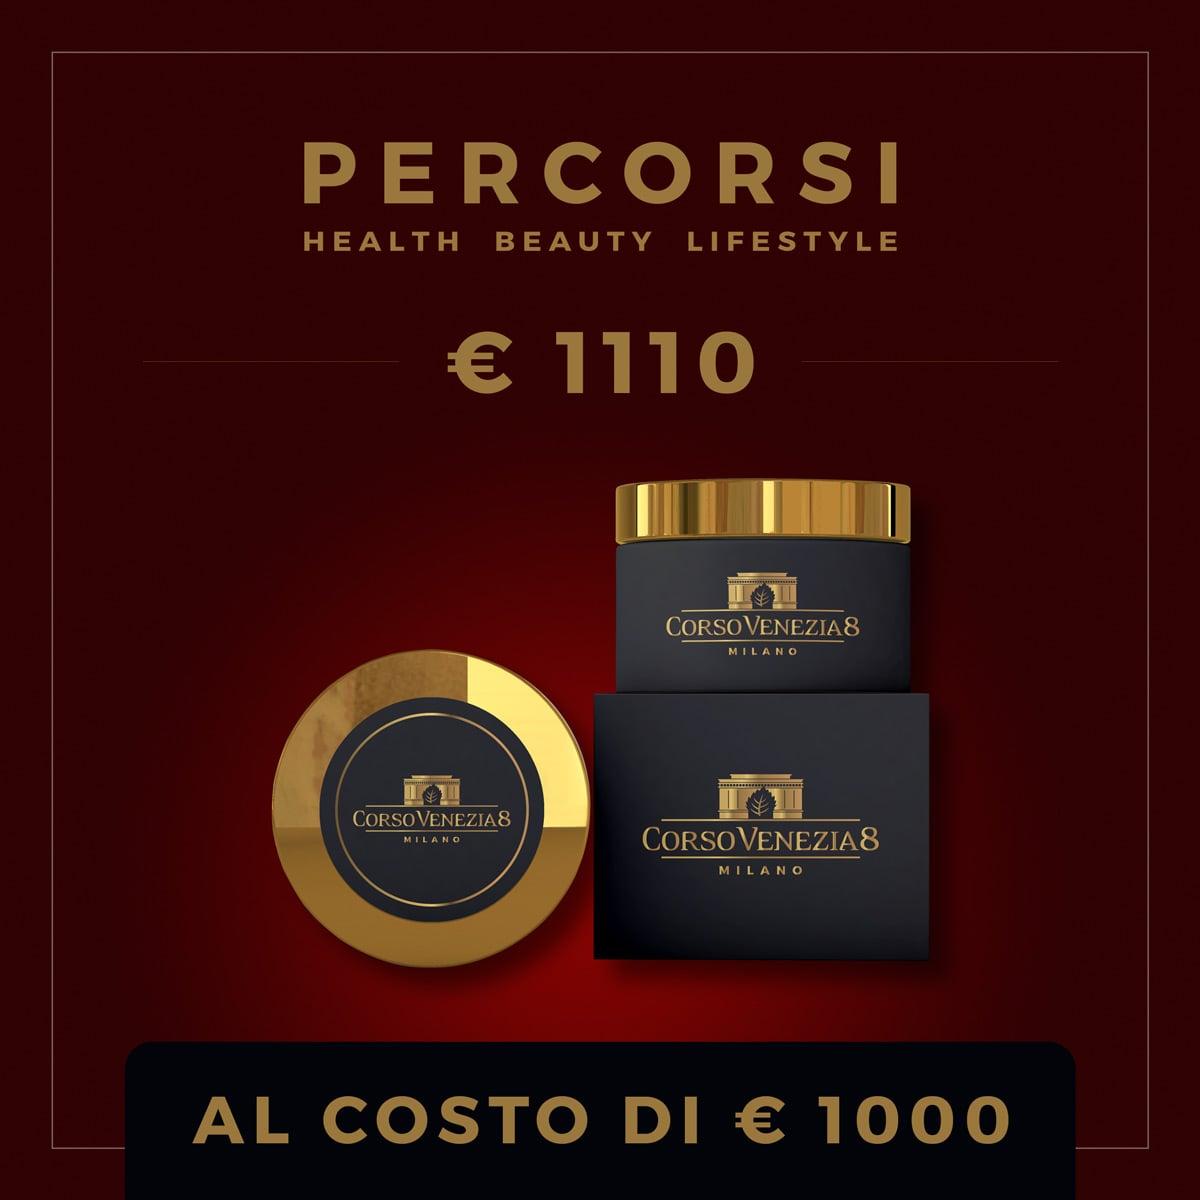 Percorsi Estetici - Voucher € 1110